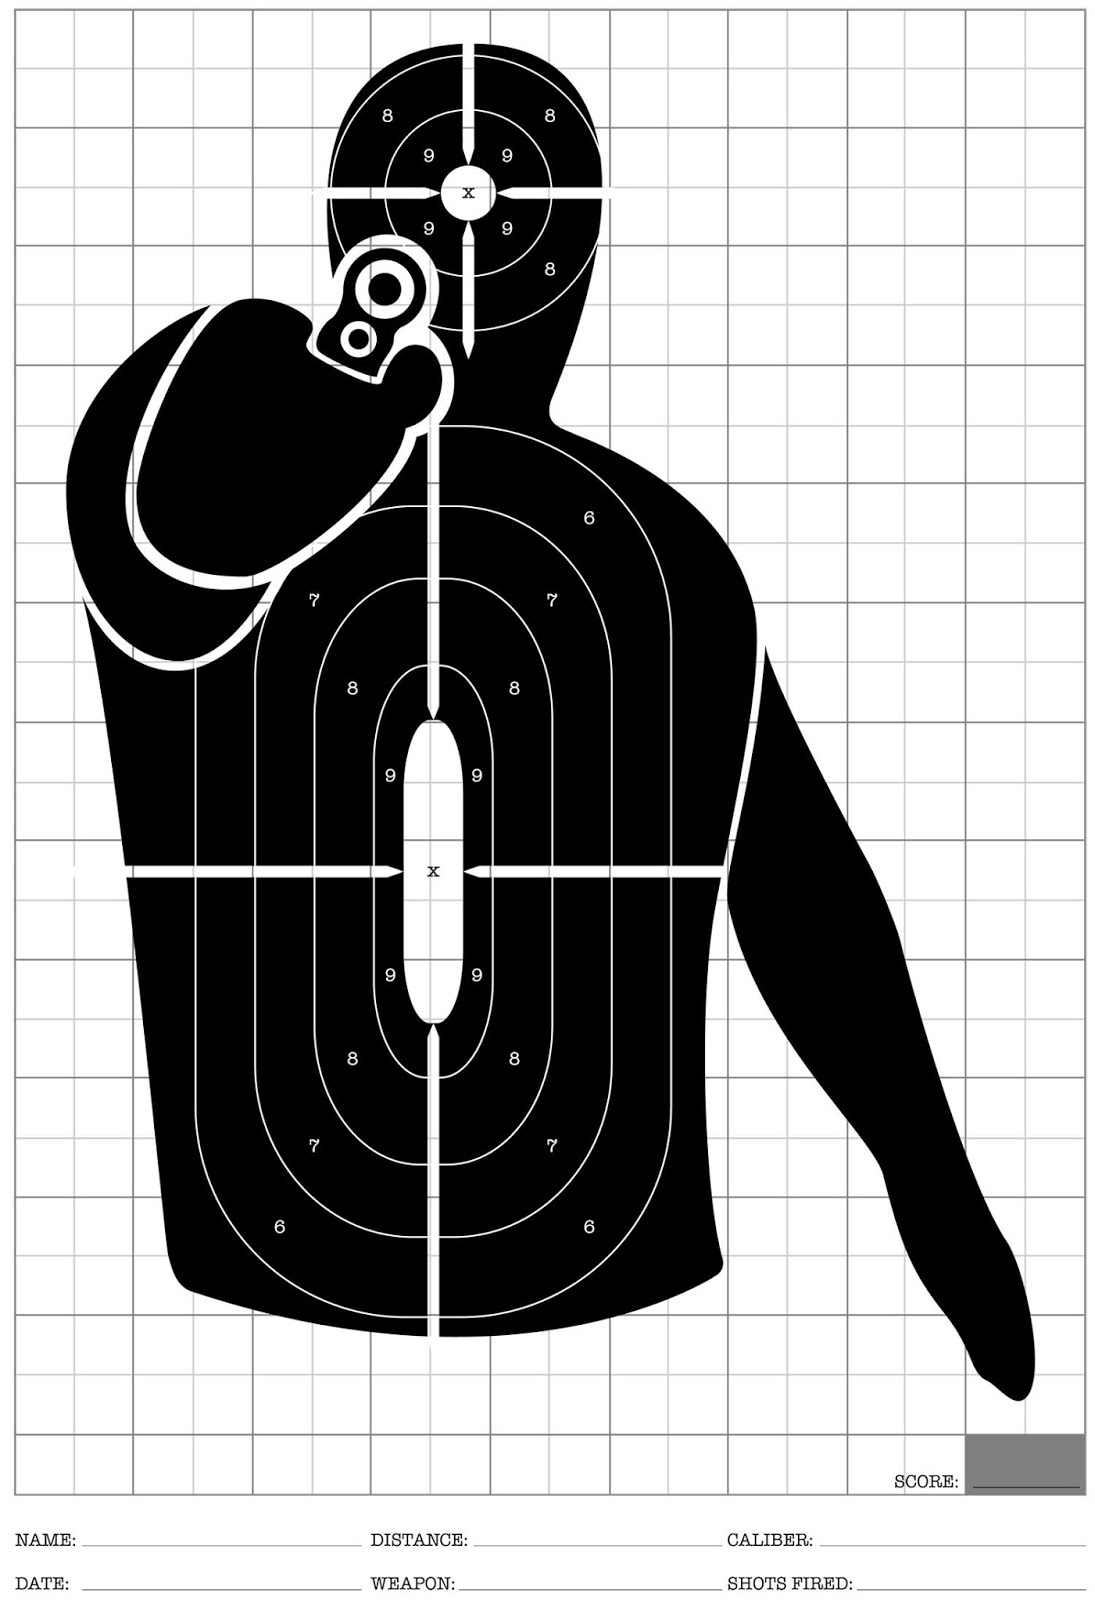 Essay on shooting